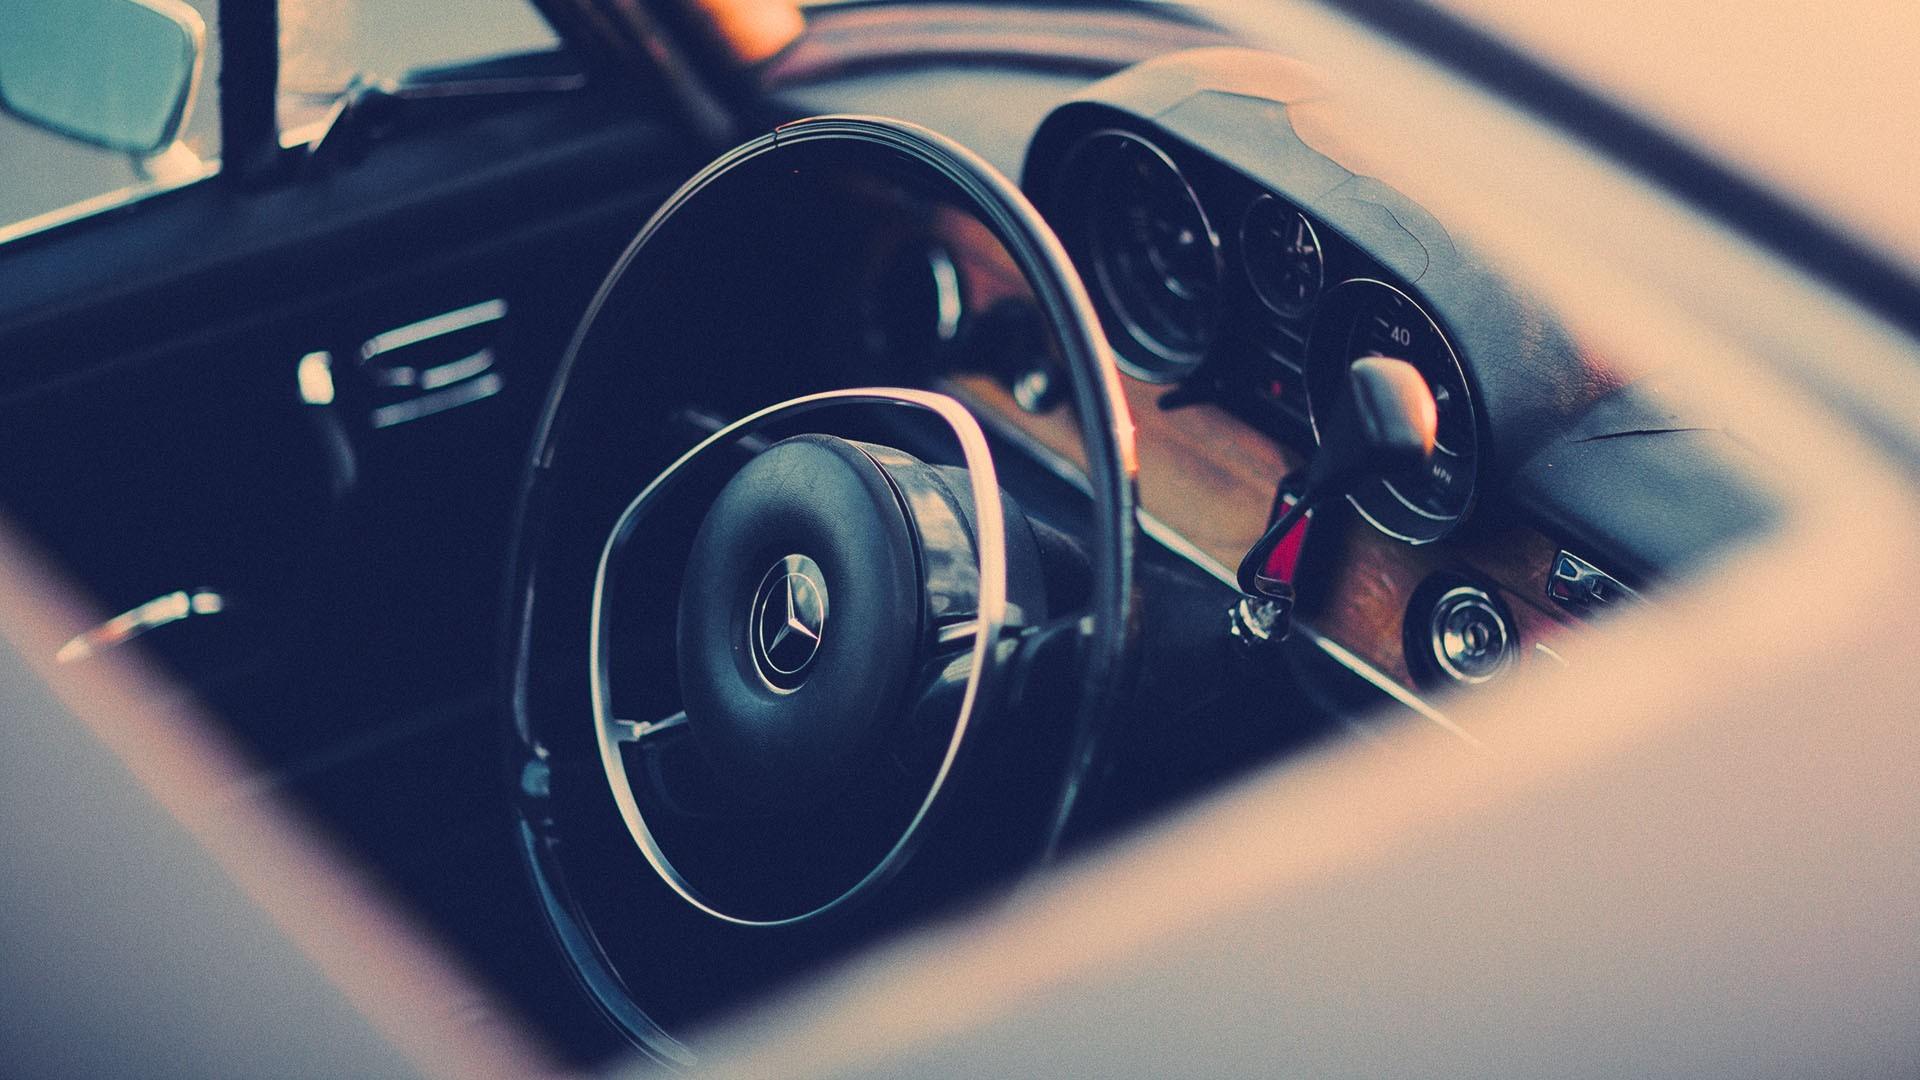 General 1920x1080 car old car Mercedes-Benz high angle car interior steering wheel